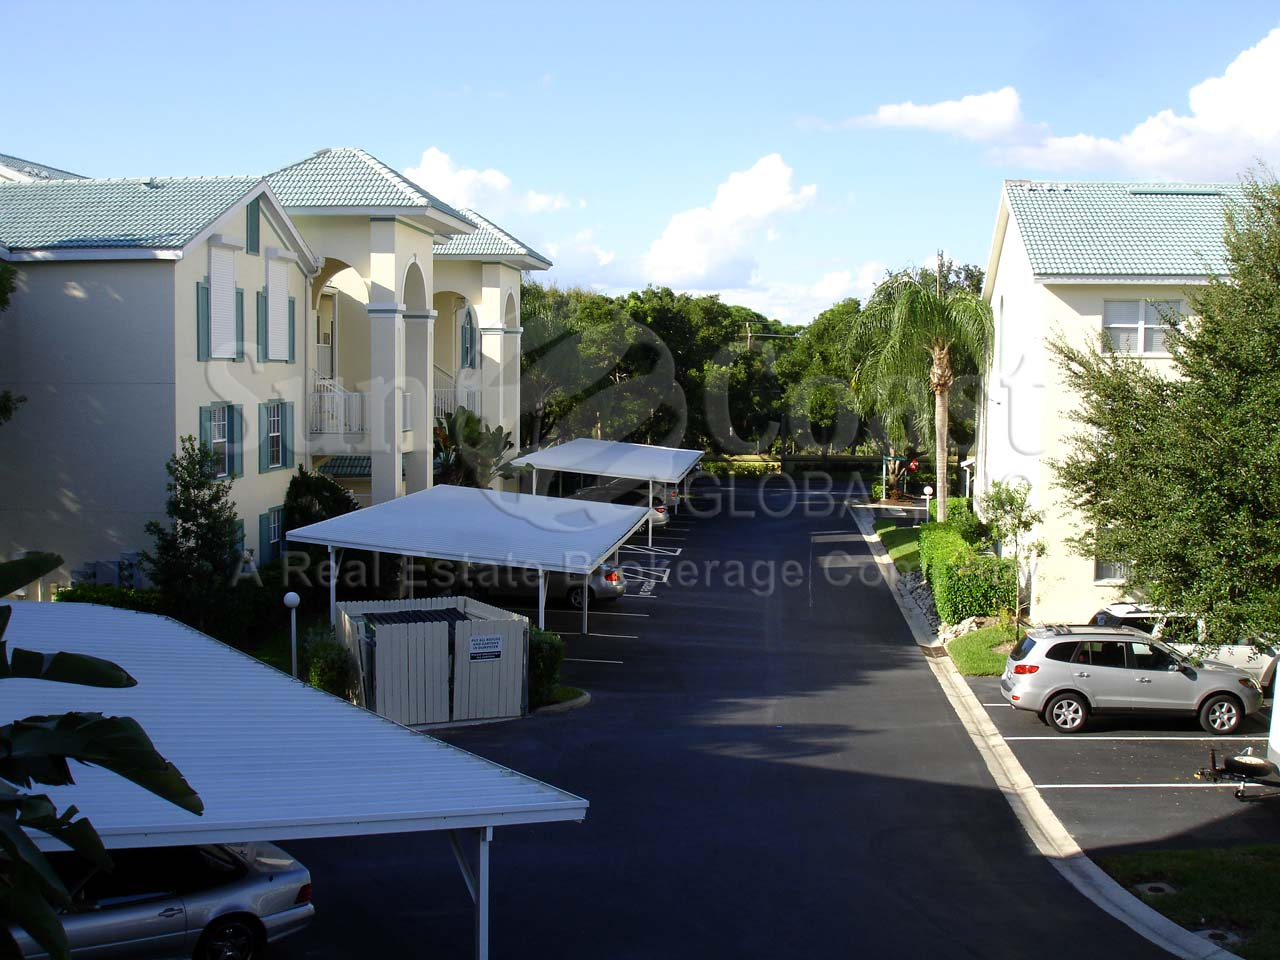 Bermuda Cove At Wiggins Bay Real Estate Naples Florida Fla Fl